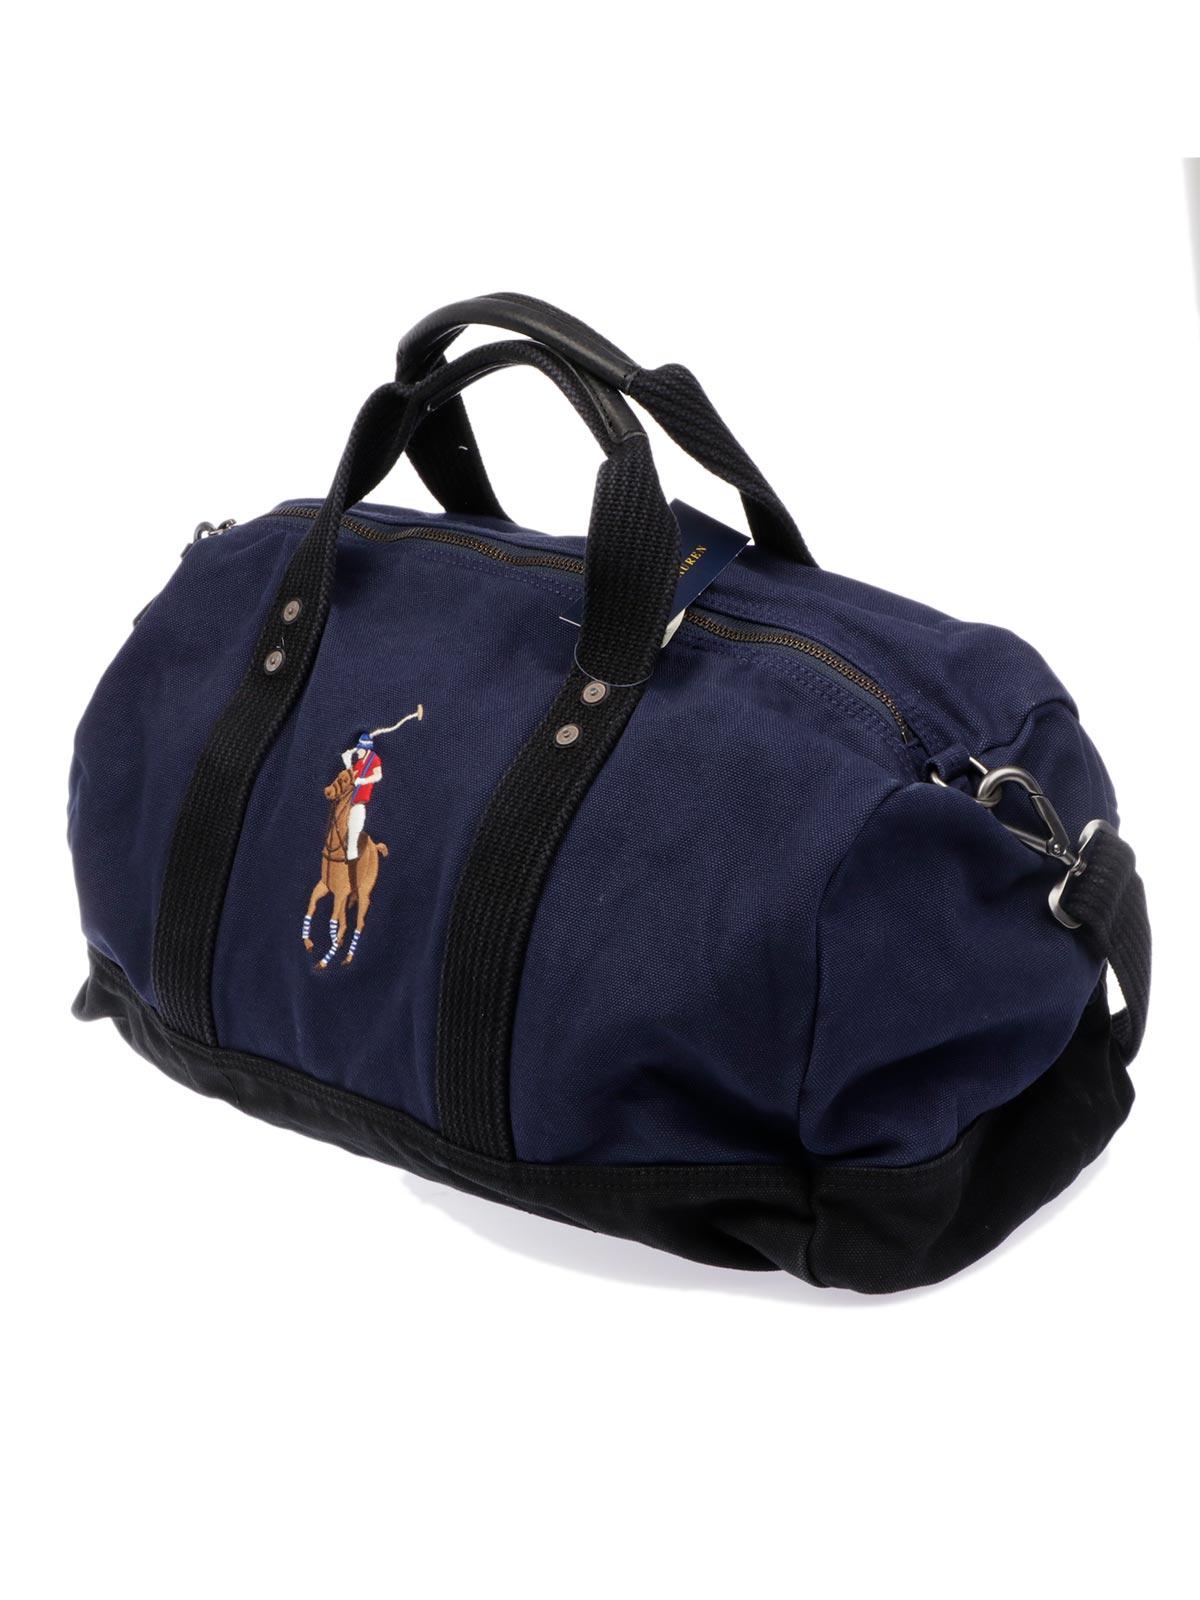 1718f91ade65 POLO RALPH LAUREN Men s Canvas Duffle Bag Navy